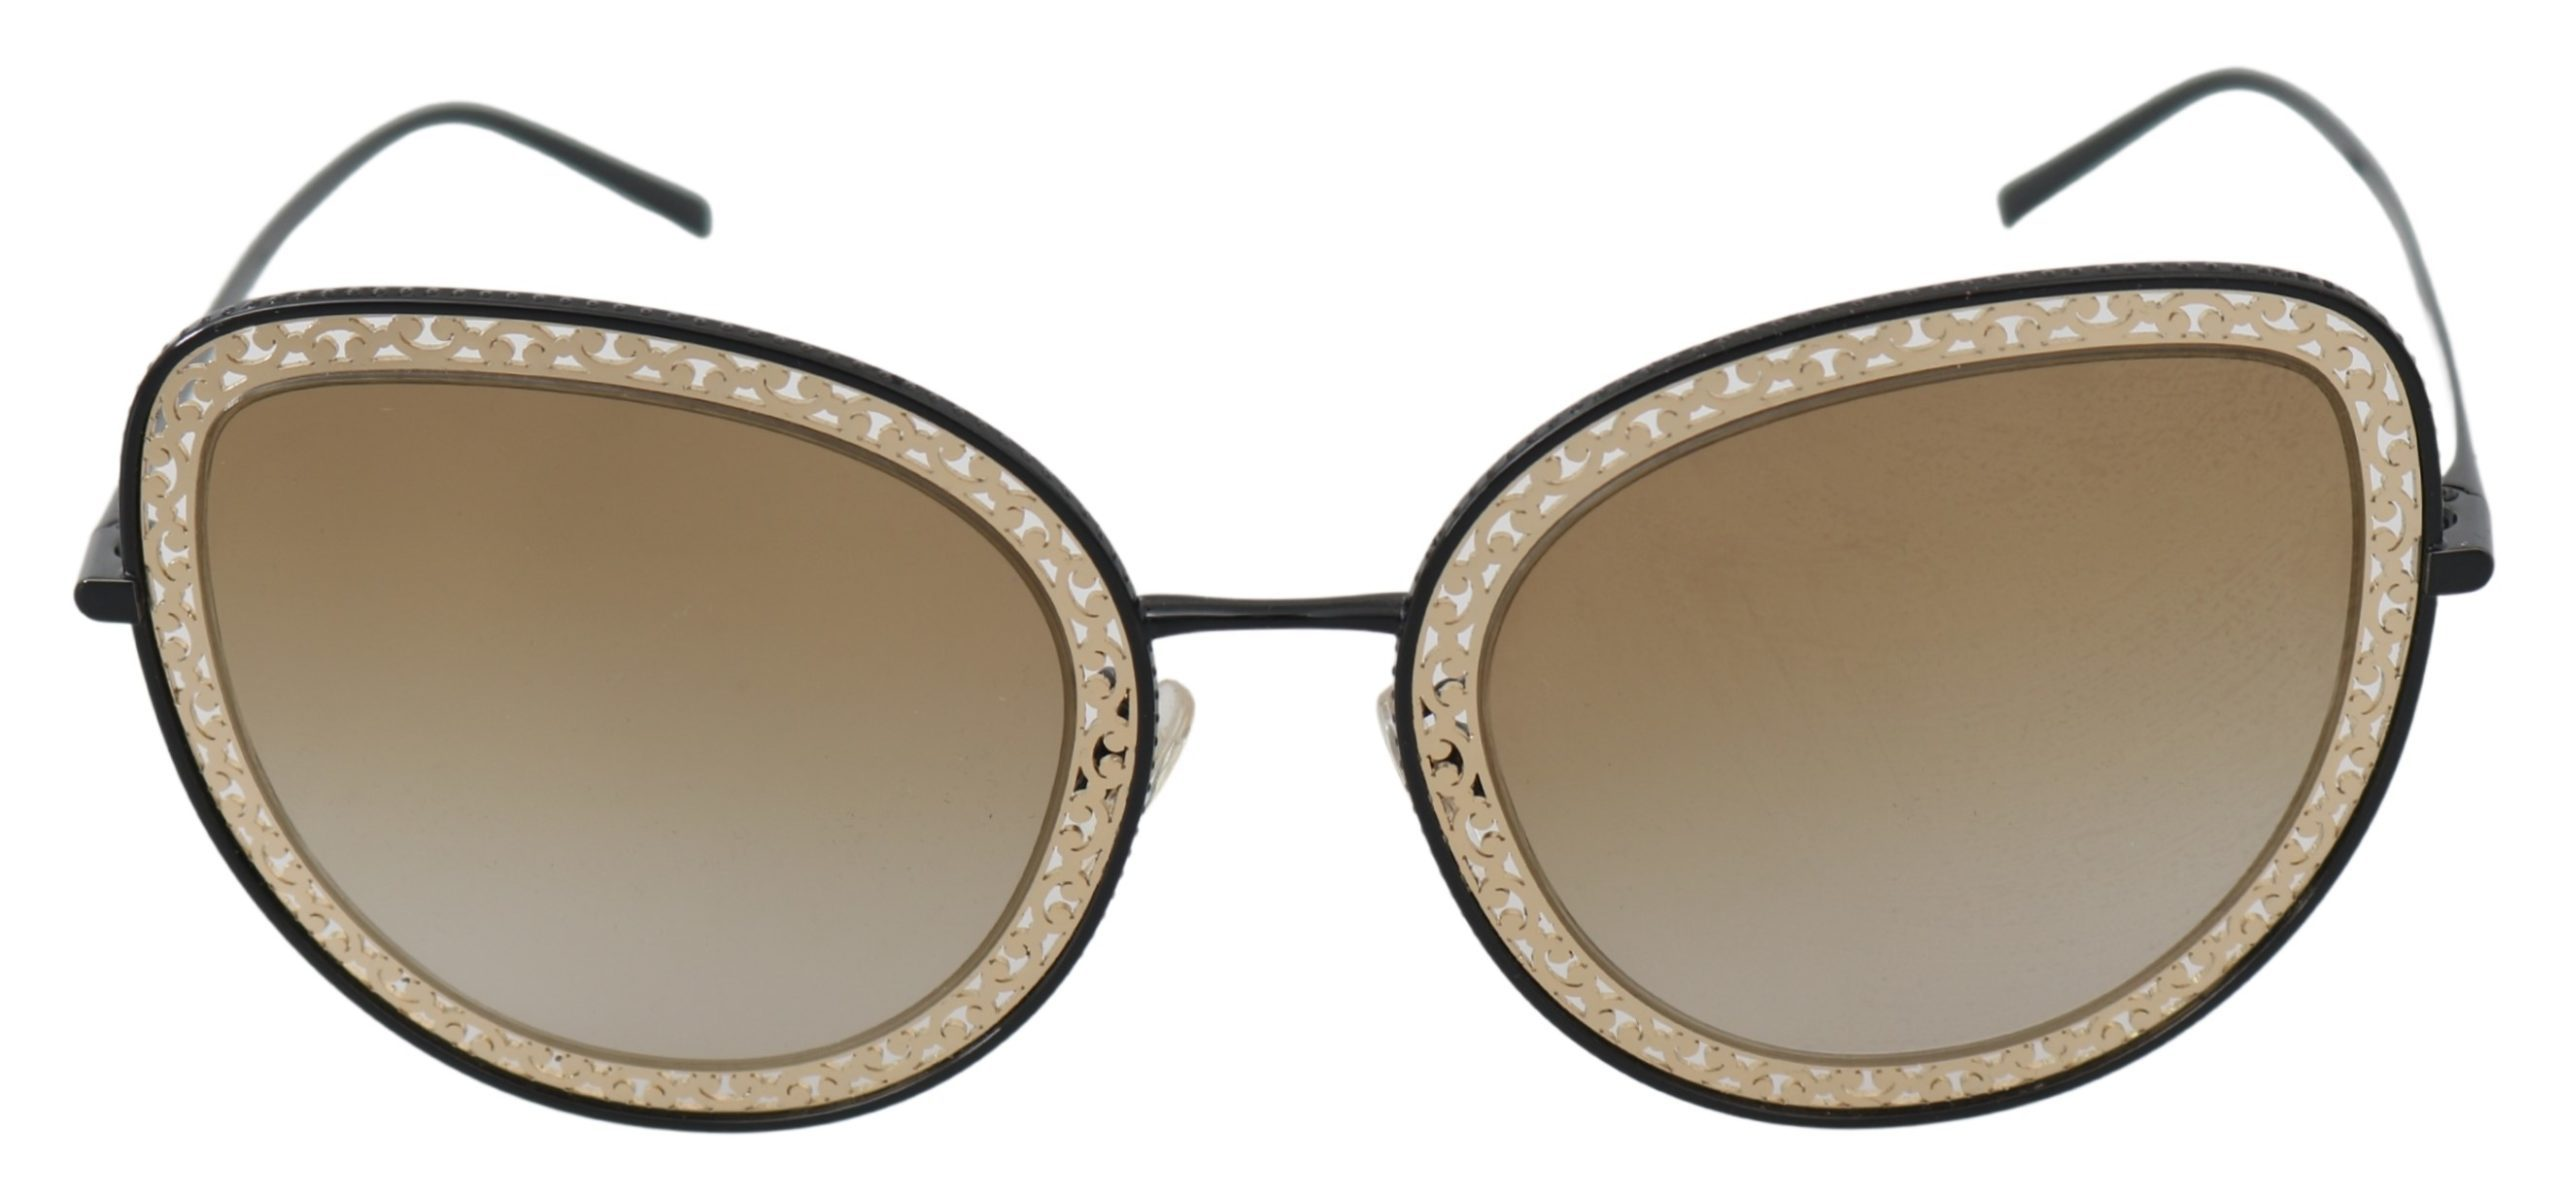 Dolce & Gabbana Women's Rectangle Metal Sunglasses Gold Black GLA754